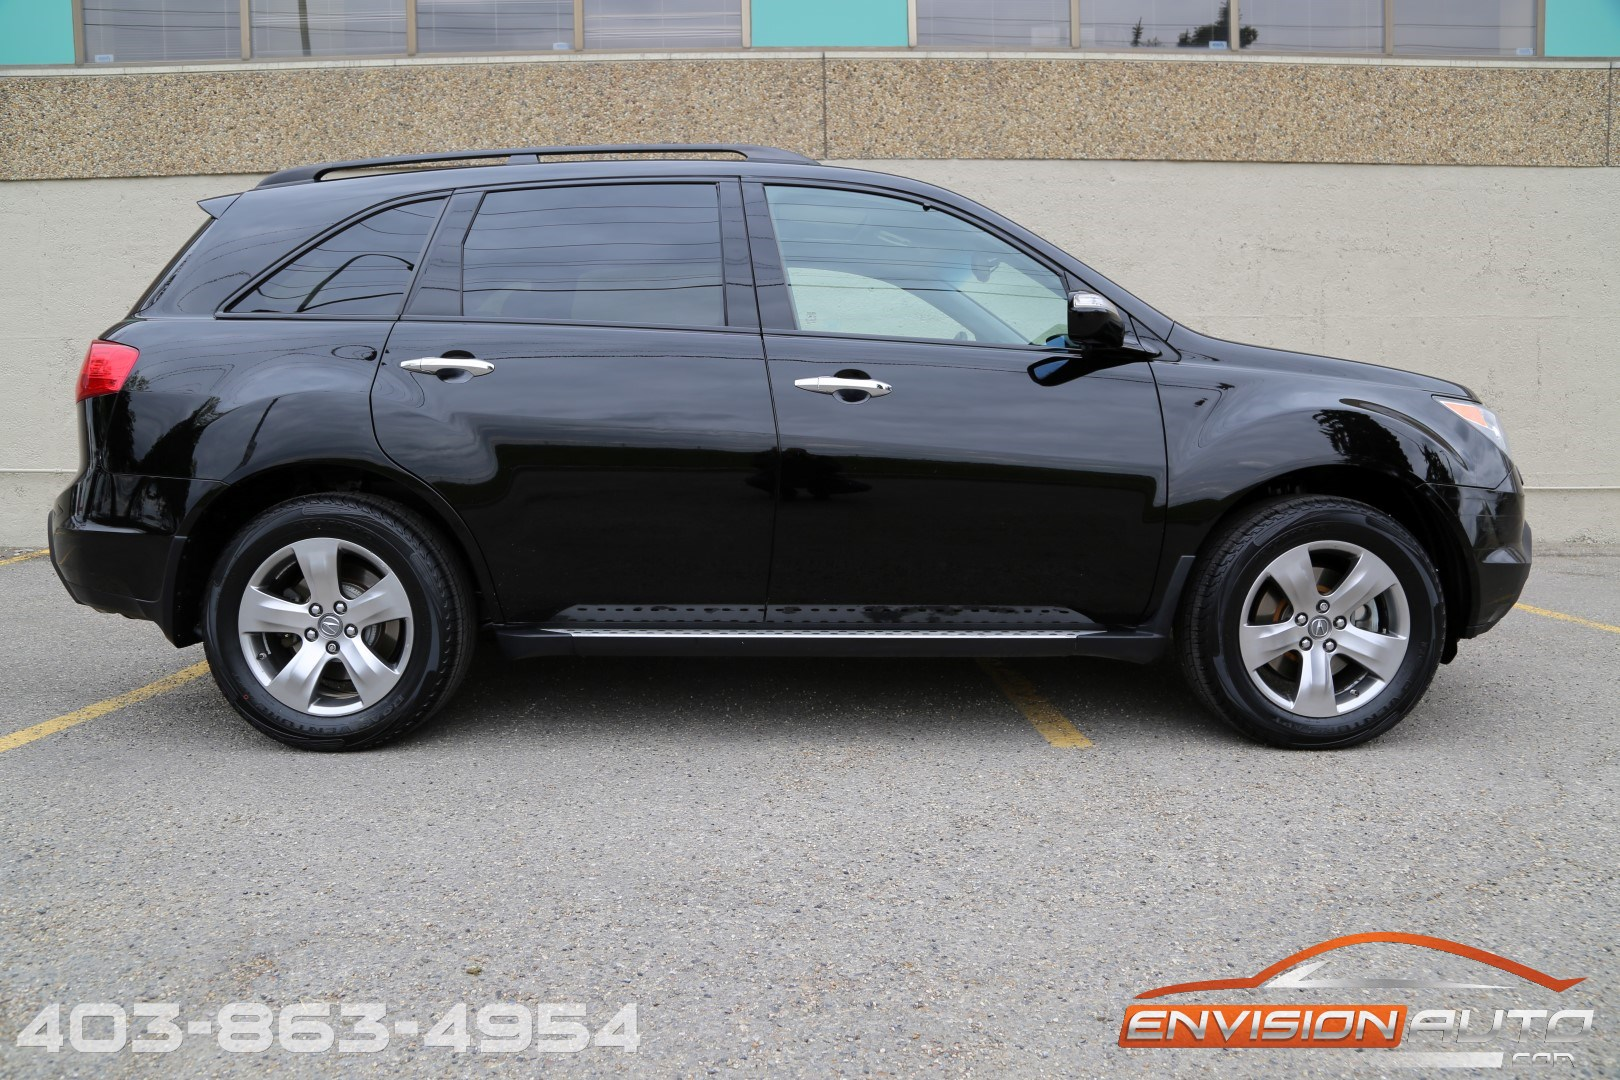 2007 Acura MDX AWD Tech & Elite | Envision Auto - Calgary ...